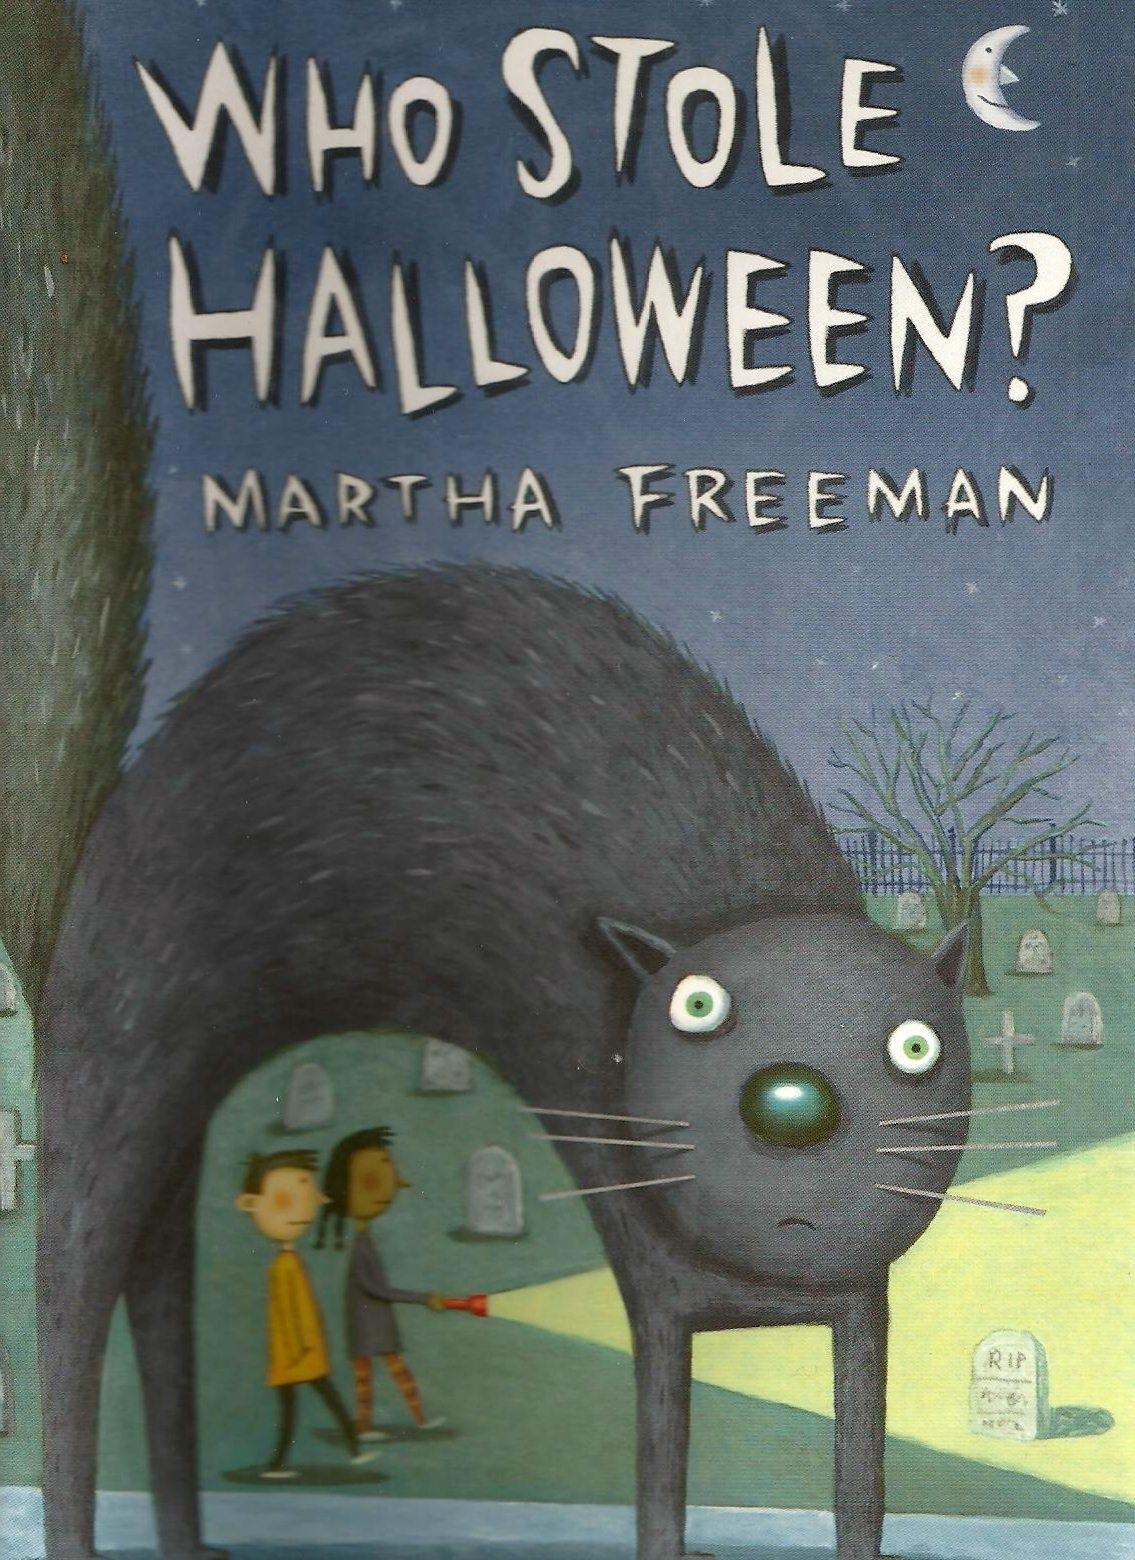 151015 halloween cover 001.jpg